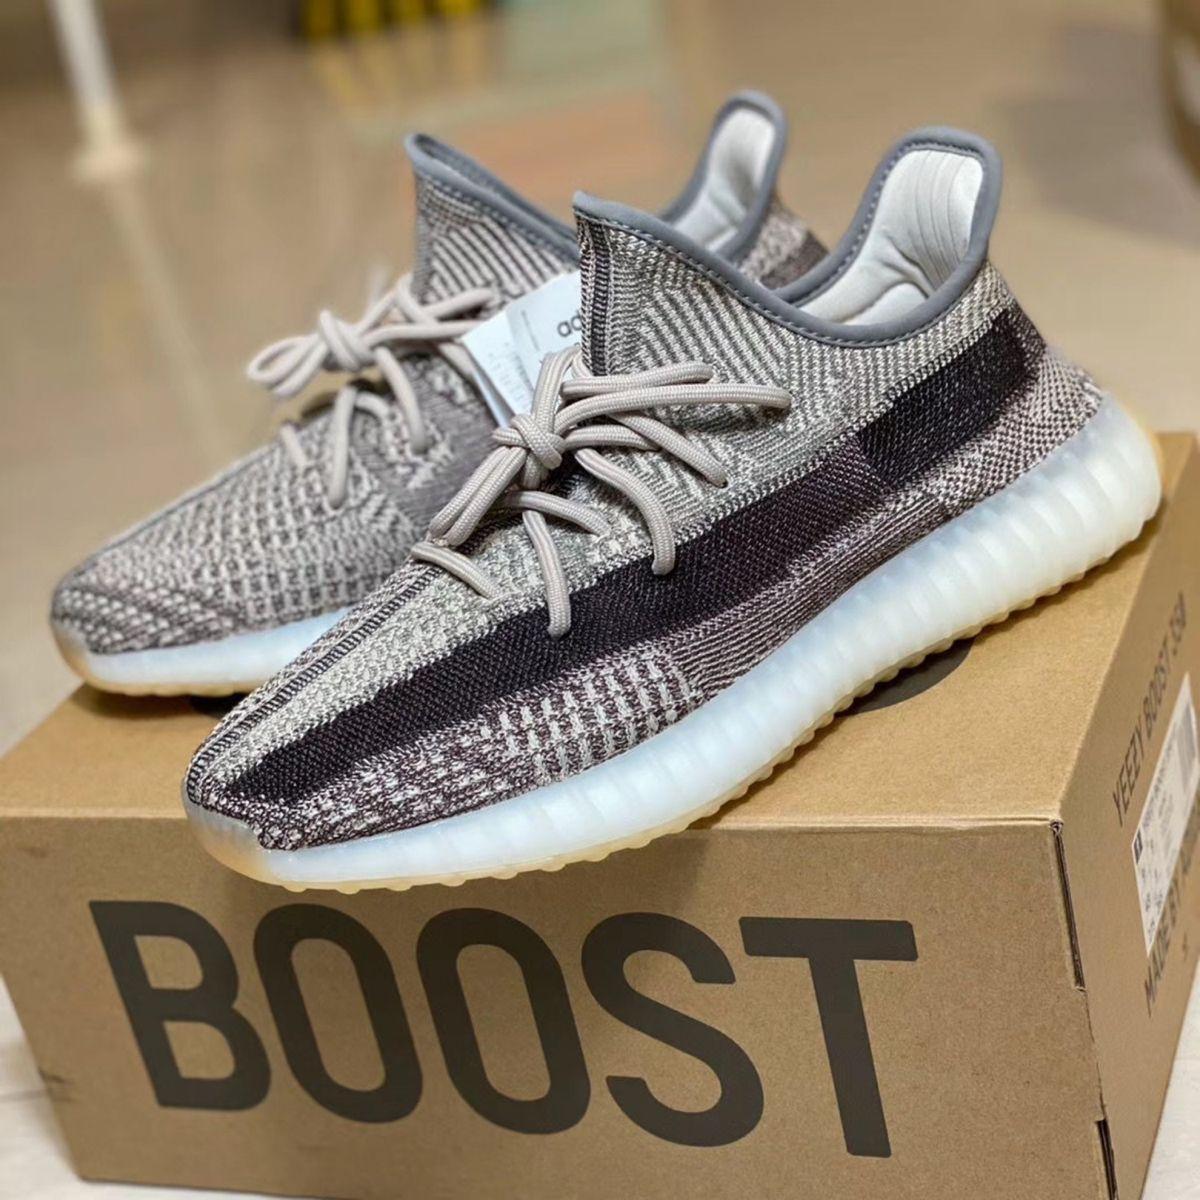 Adidas yeezy boost, Adidas yeezy boost